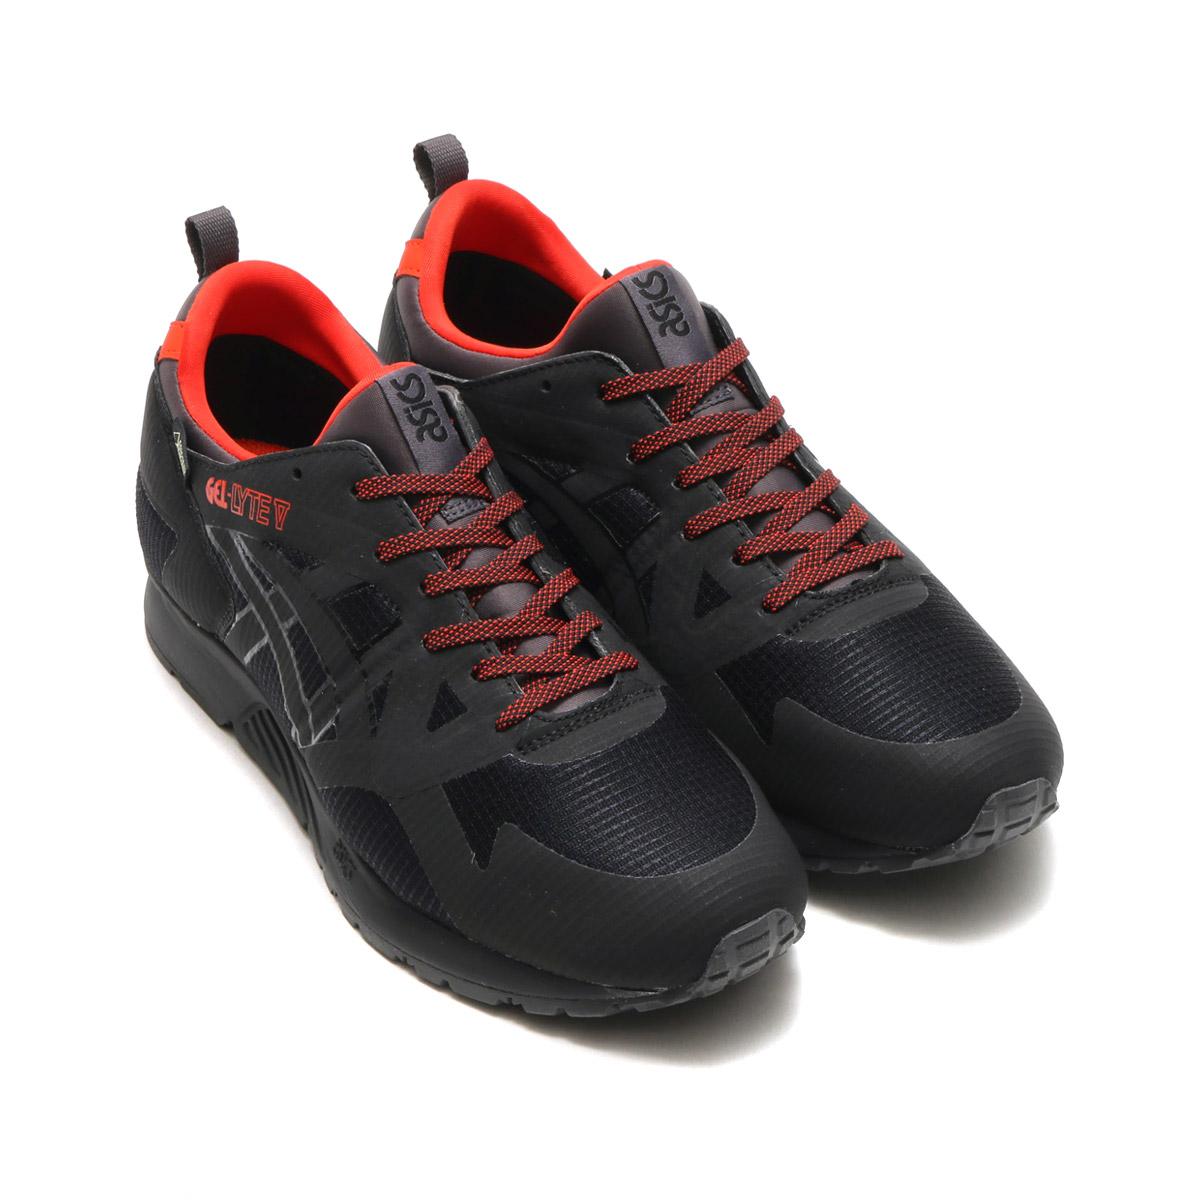 sports shoes 2ac1f 0f5ad asics Tiger GEL-LYTE V NS GT-X (アシックス タイガー ゲルライト ファイブ エヌエス ジーティーエックス)  BLACK/BLACK【メンズ レディース スニーカー】17AW-I atmos-tokyo